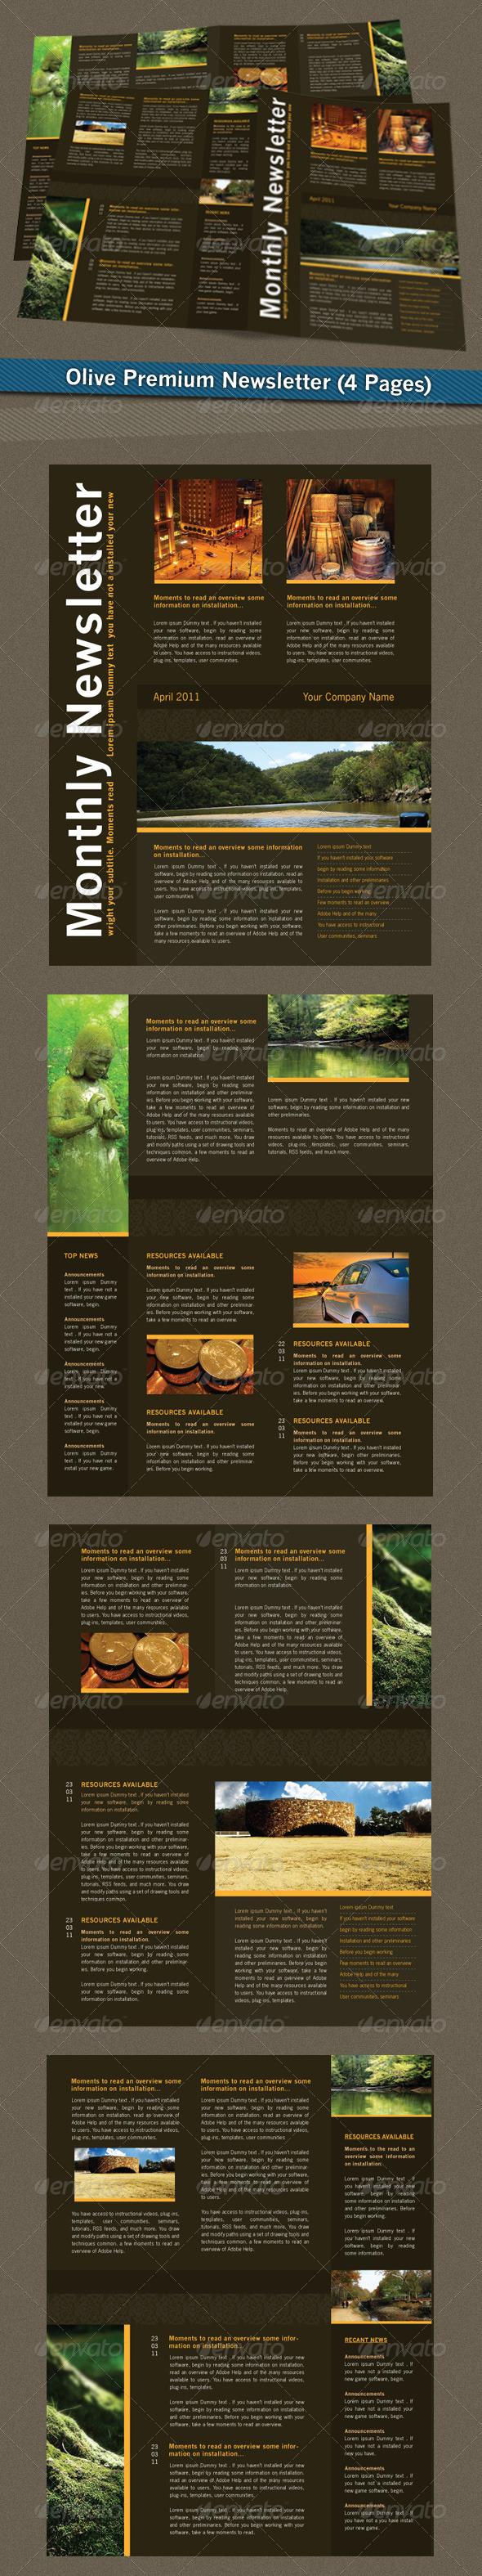 GraphicRiver Olive Premium Newsletter 179891